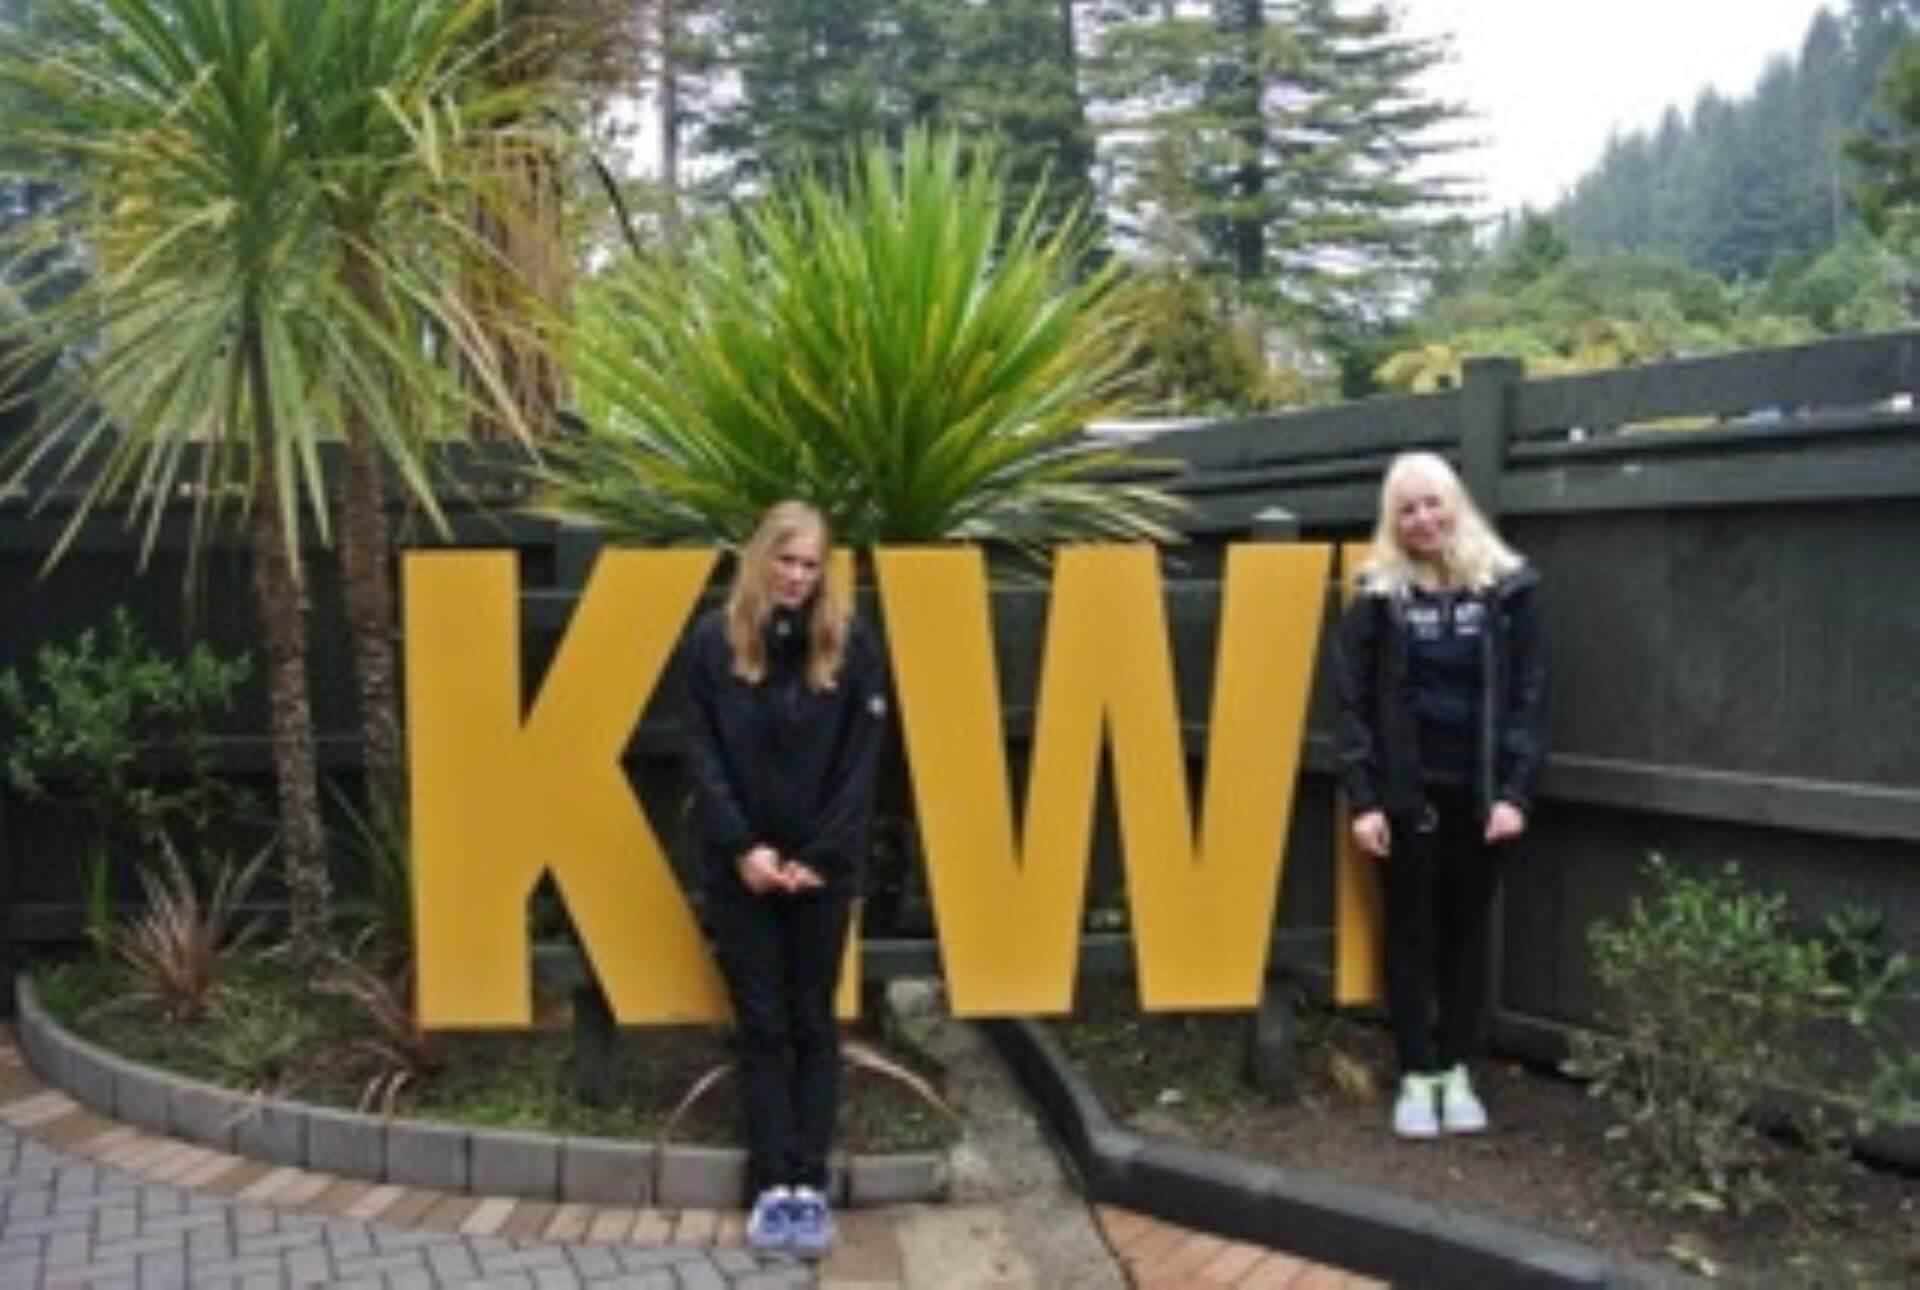 australia Exchange students with a sign Kiwi